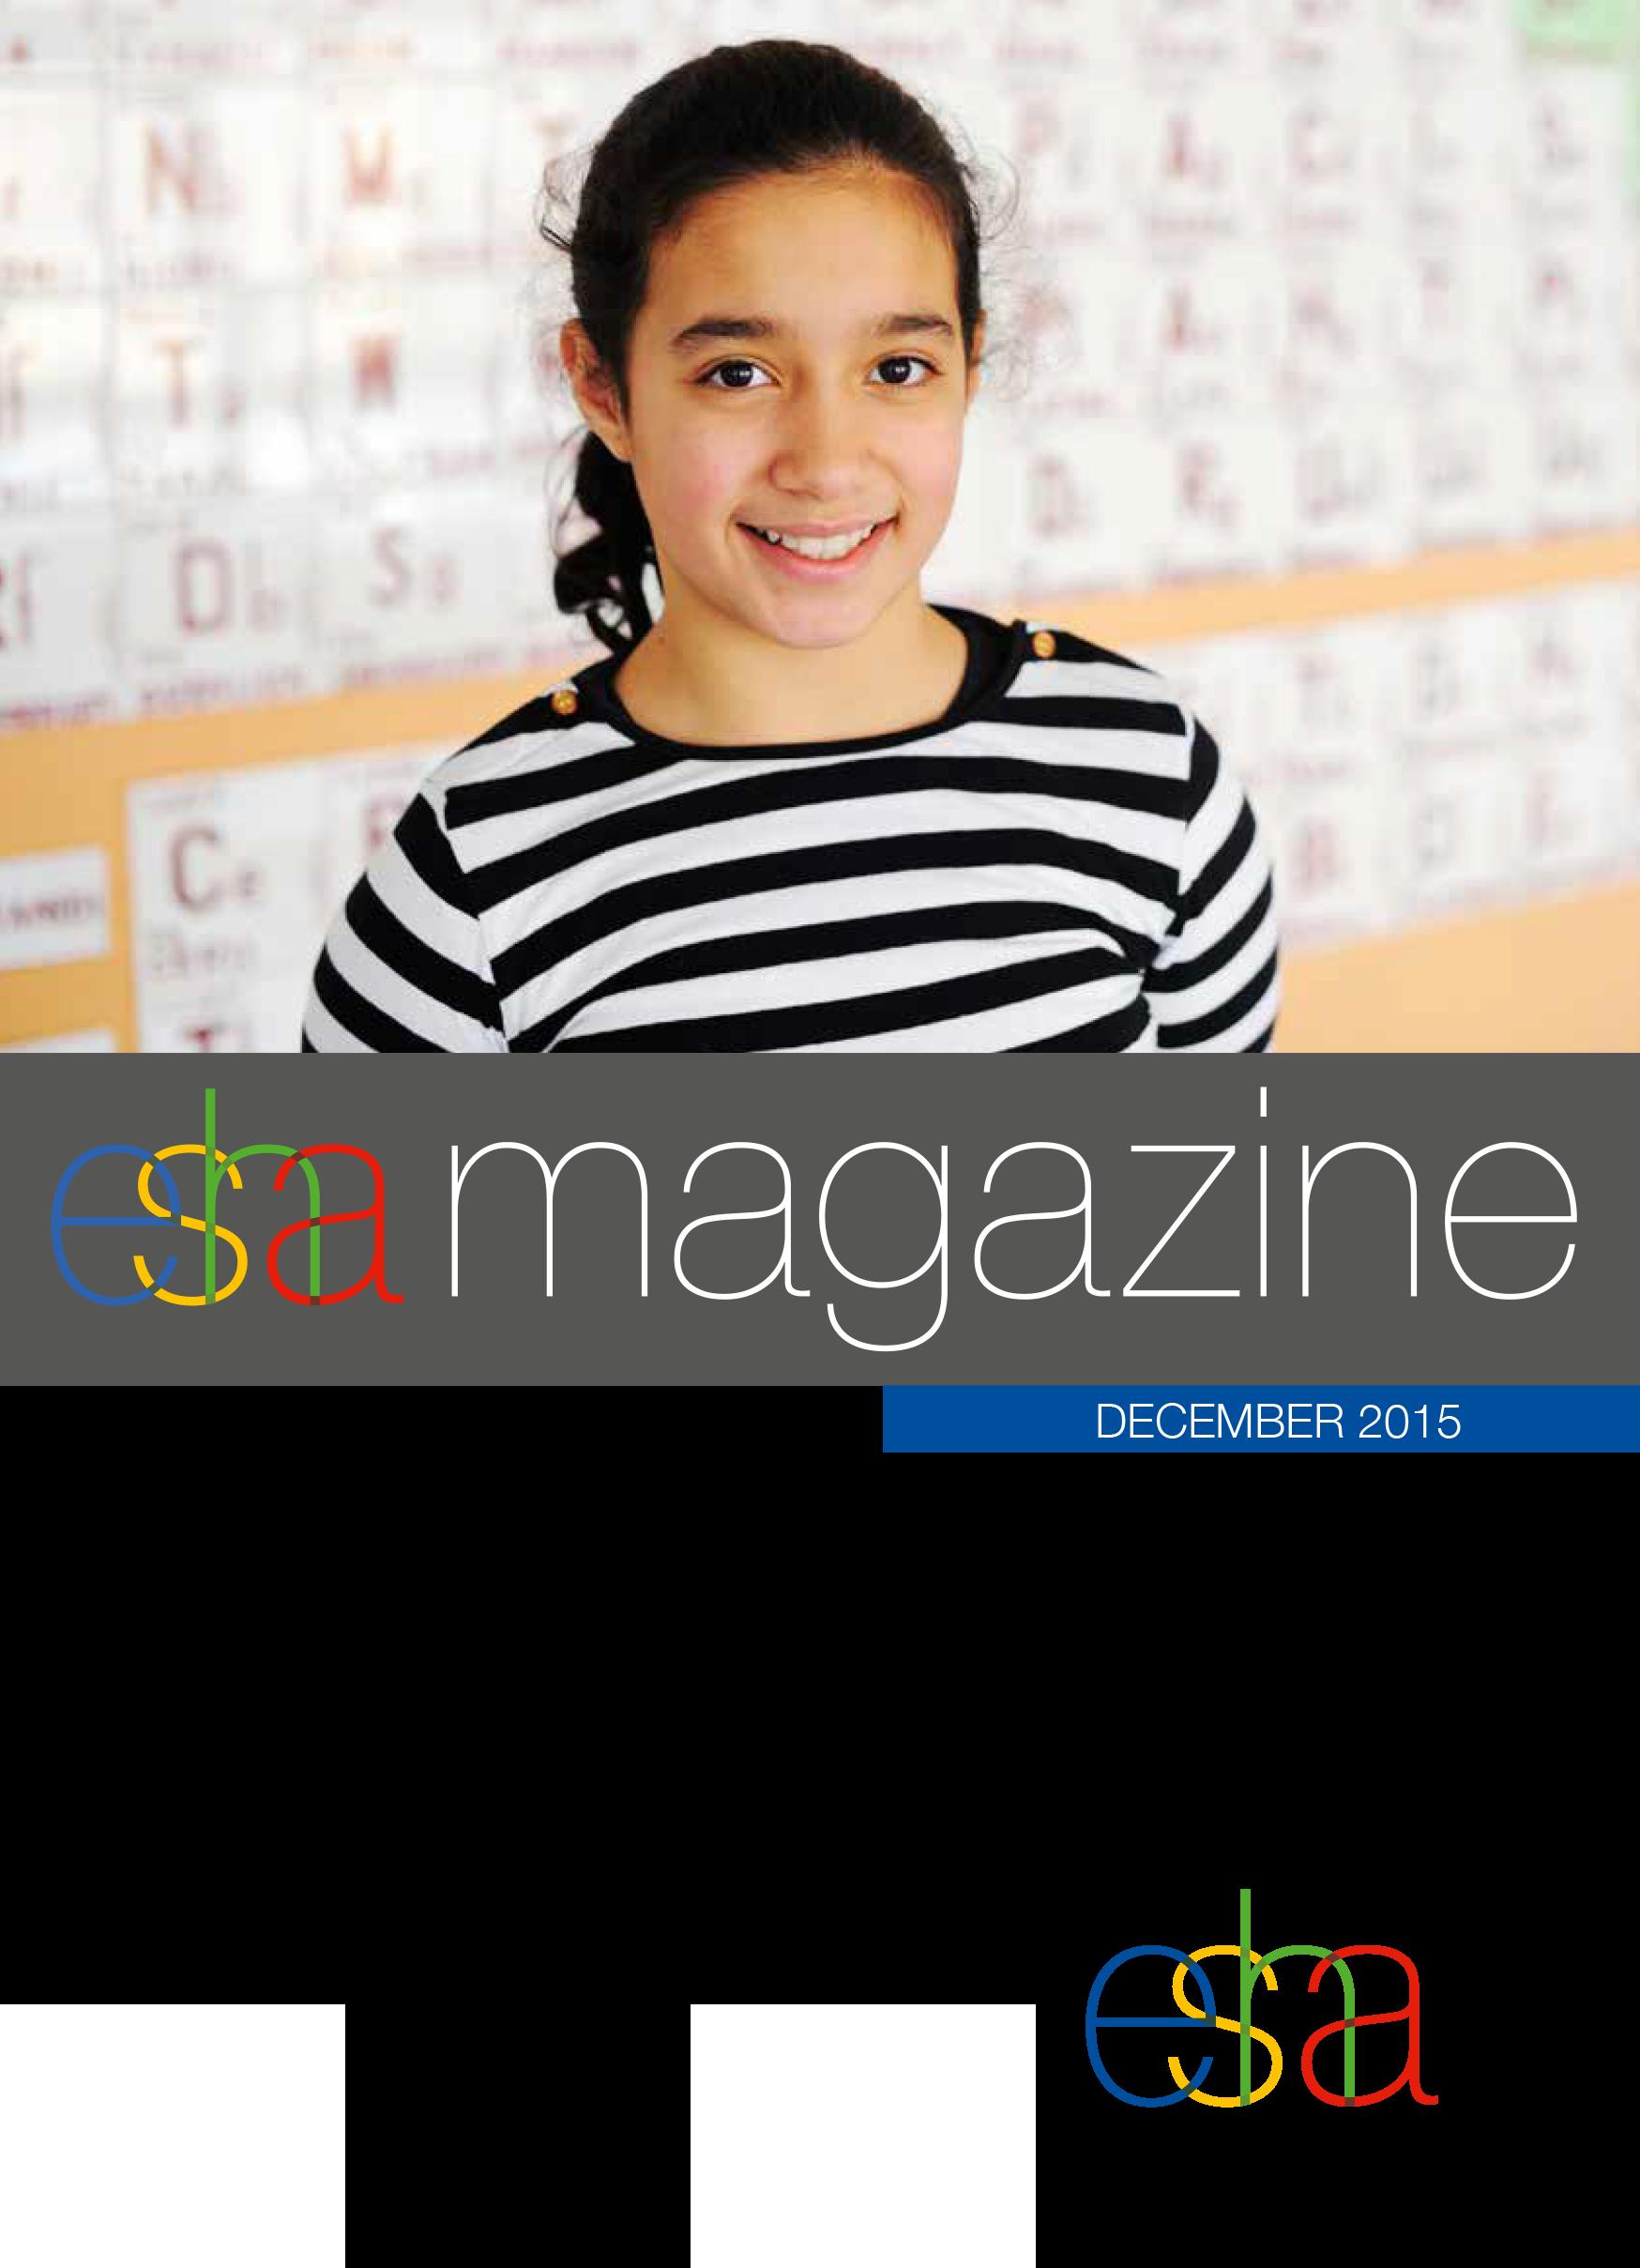 esha-magazine-december-2015-1-kopieren